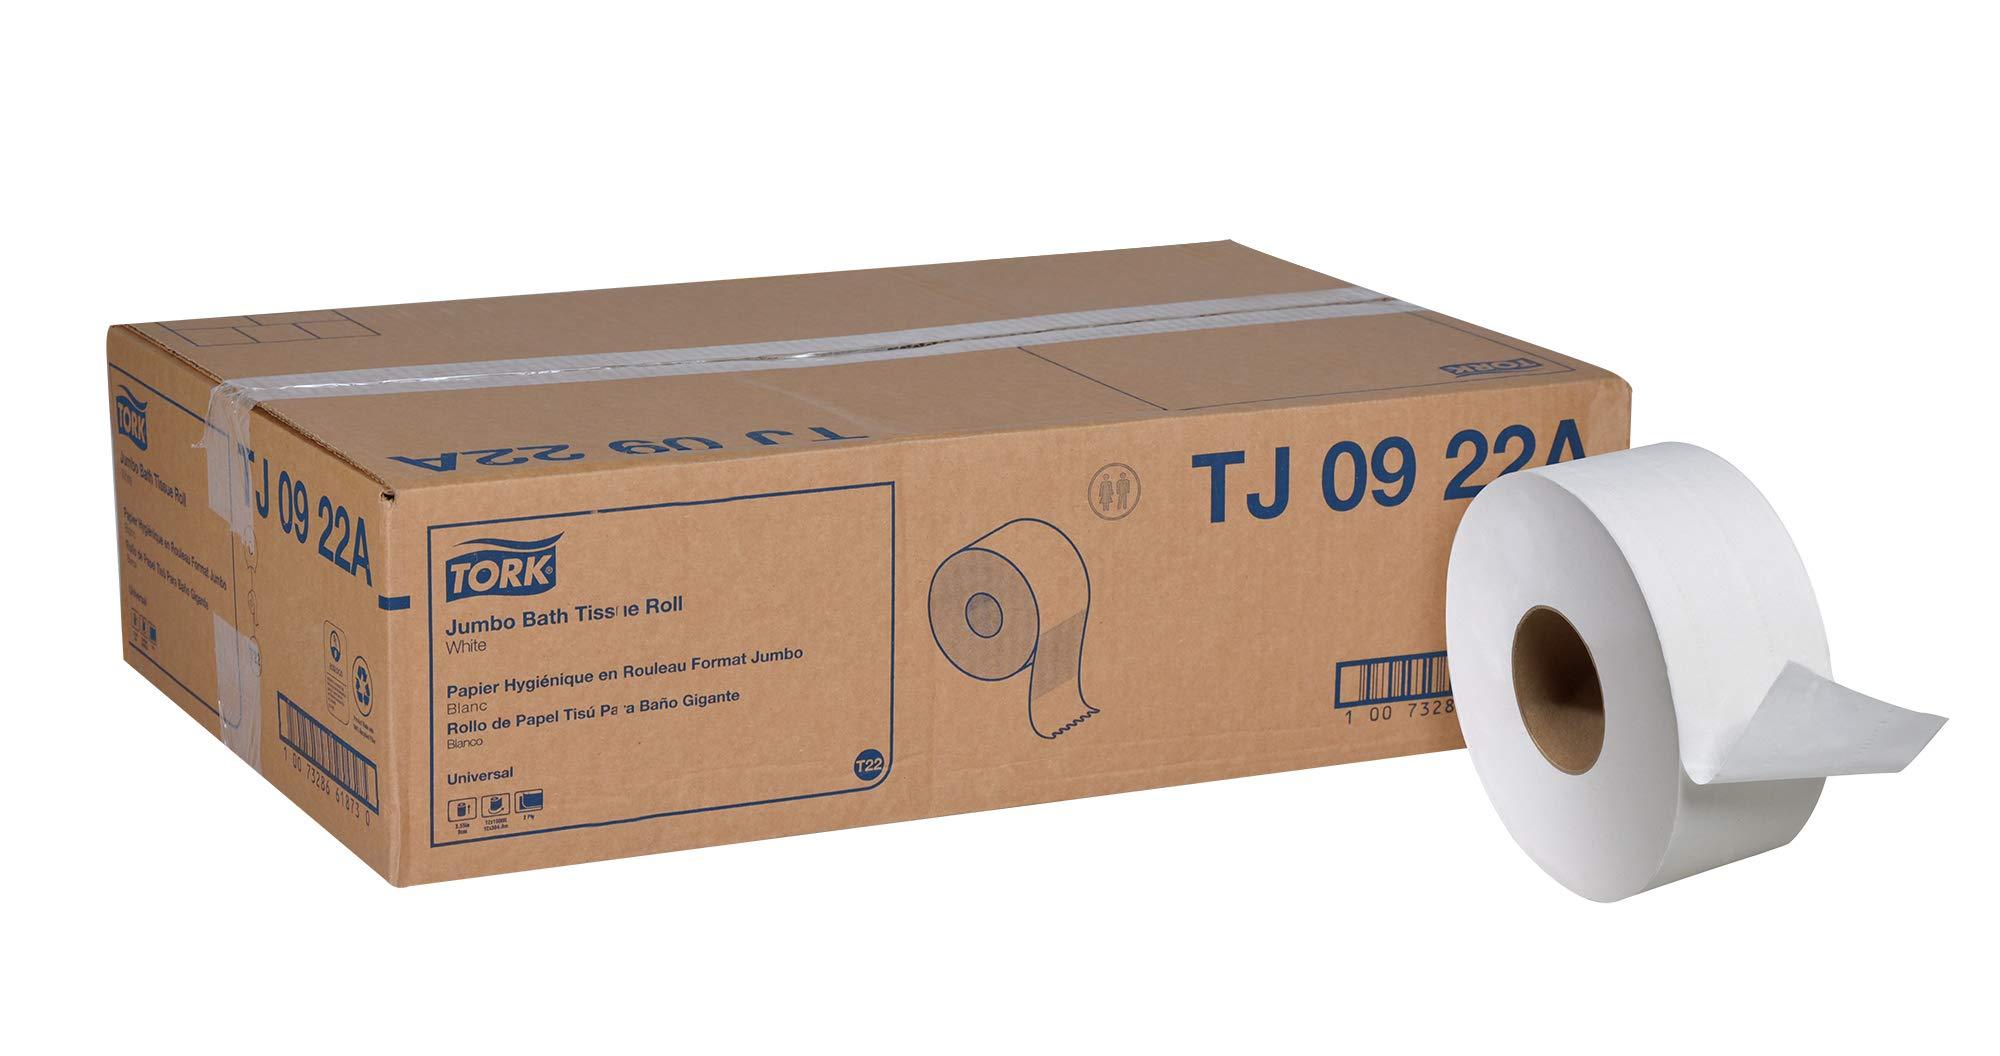 Tork Universal TJ0922A Jumbo Bath Tissue Roll, 2-Ply, 8.8'' Dia, 3.55'' Width x 1,000' Length, White (Case of 12 Rolls, 1,000 per Roll, 12,000 Feet) by Tork